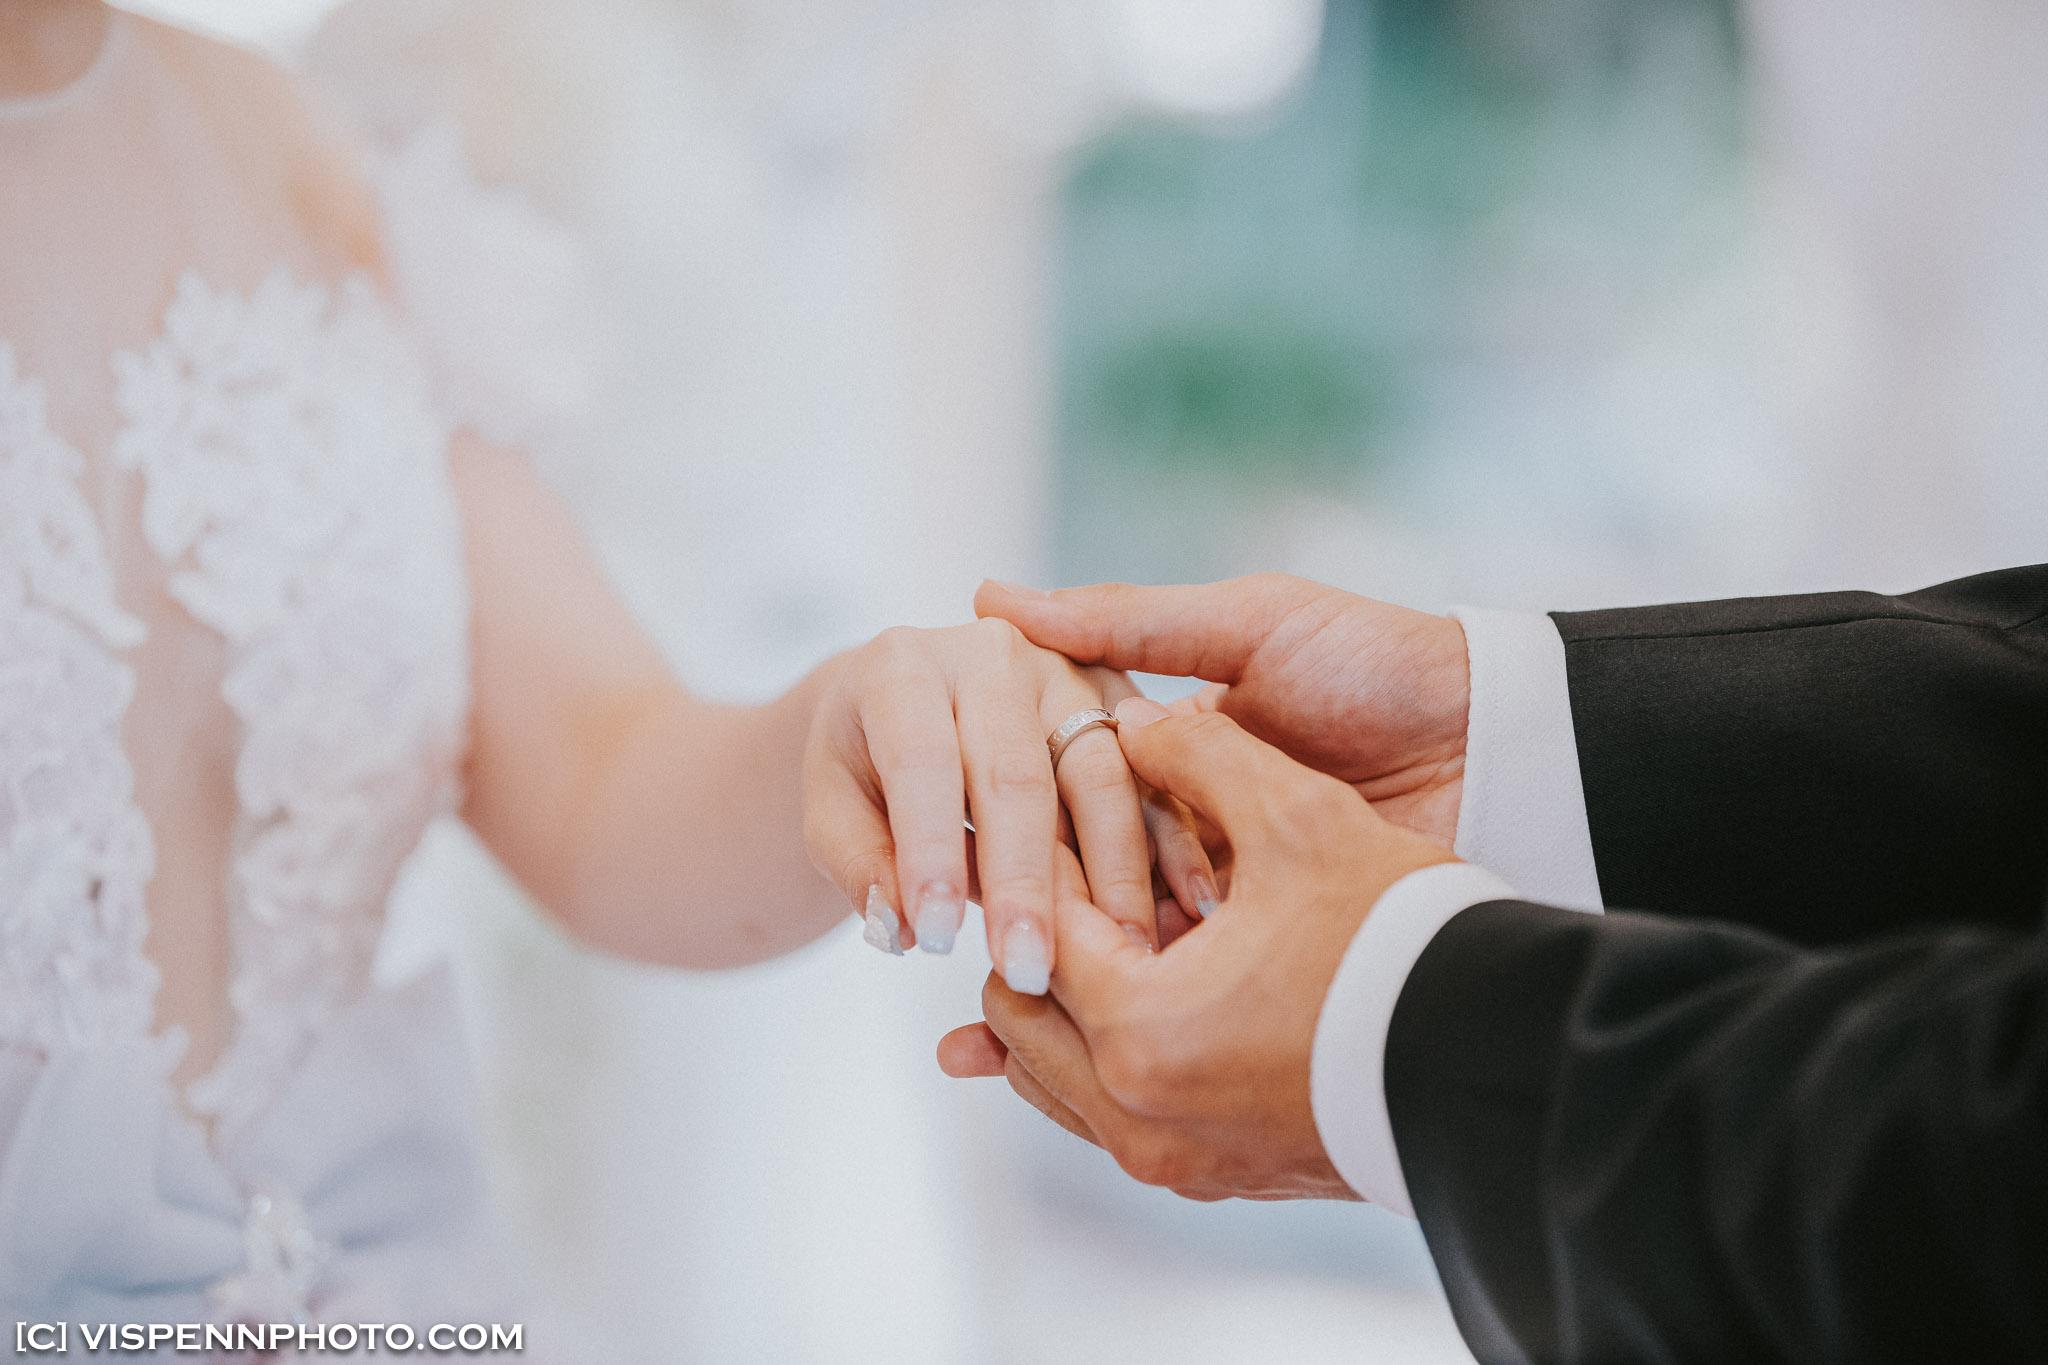 WEDDING DAY Photography Melbourne VISPENN 墨尔本 婚礼跟拍 婚礼摄像 婚礼摄影 结婚照 登记照 VISPENN H4 0395